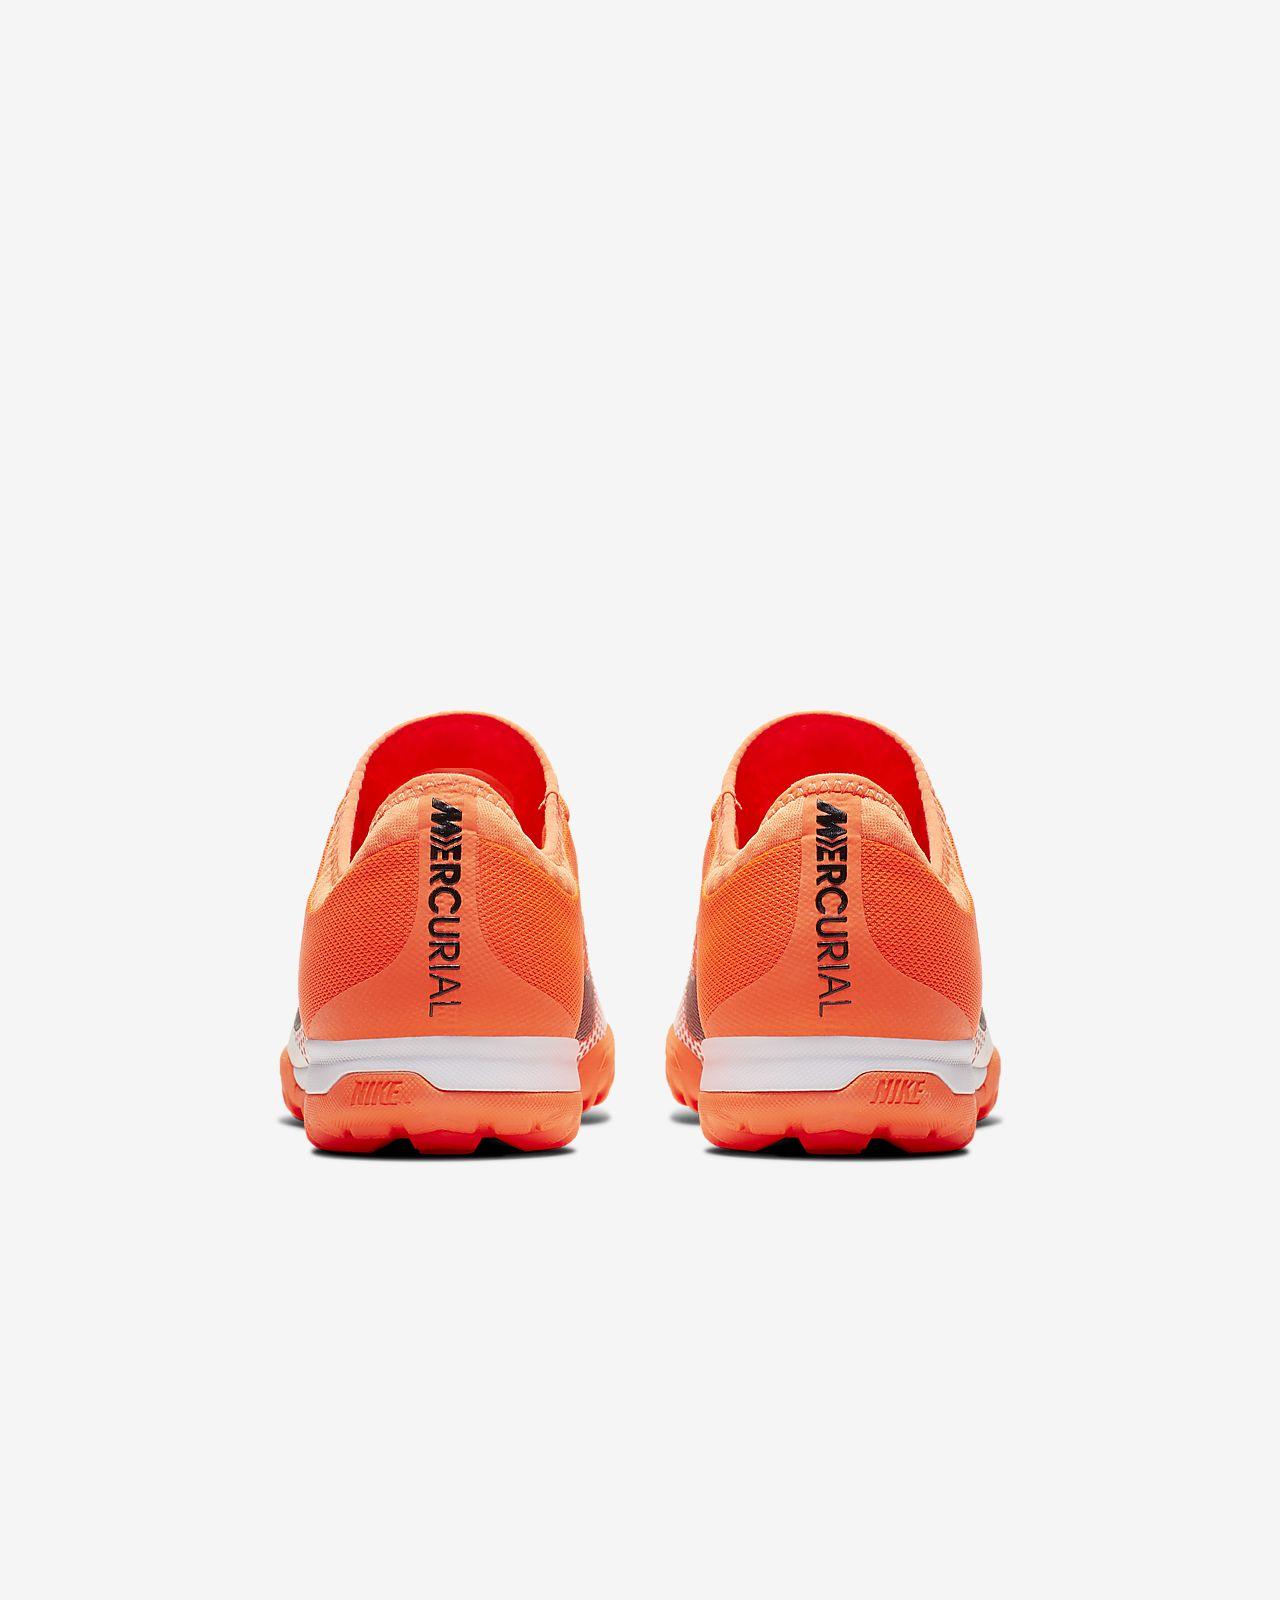 5bd8cdb0fc0 Nike MercurialX Vapor XII Pro TF Turf Football Shoe. Nike.com CA